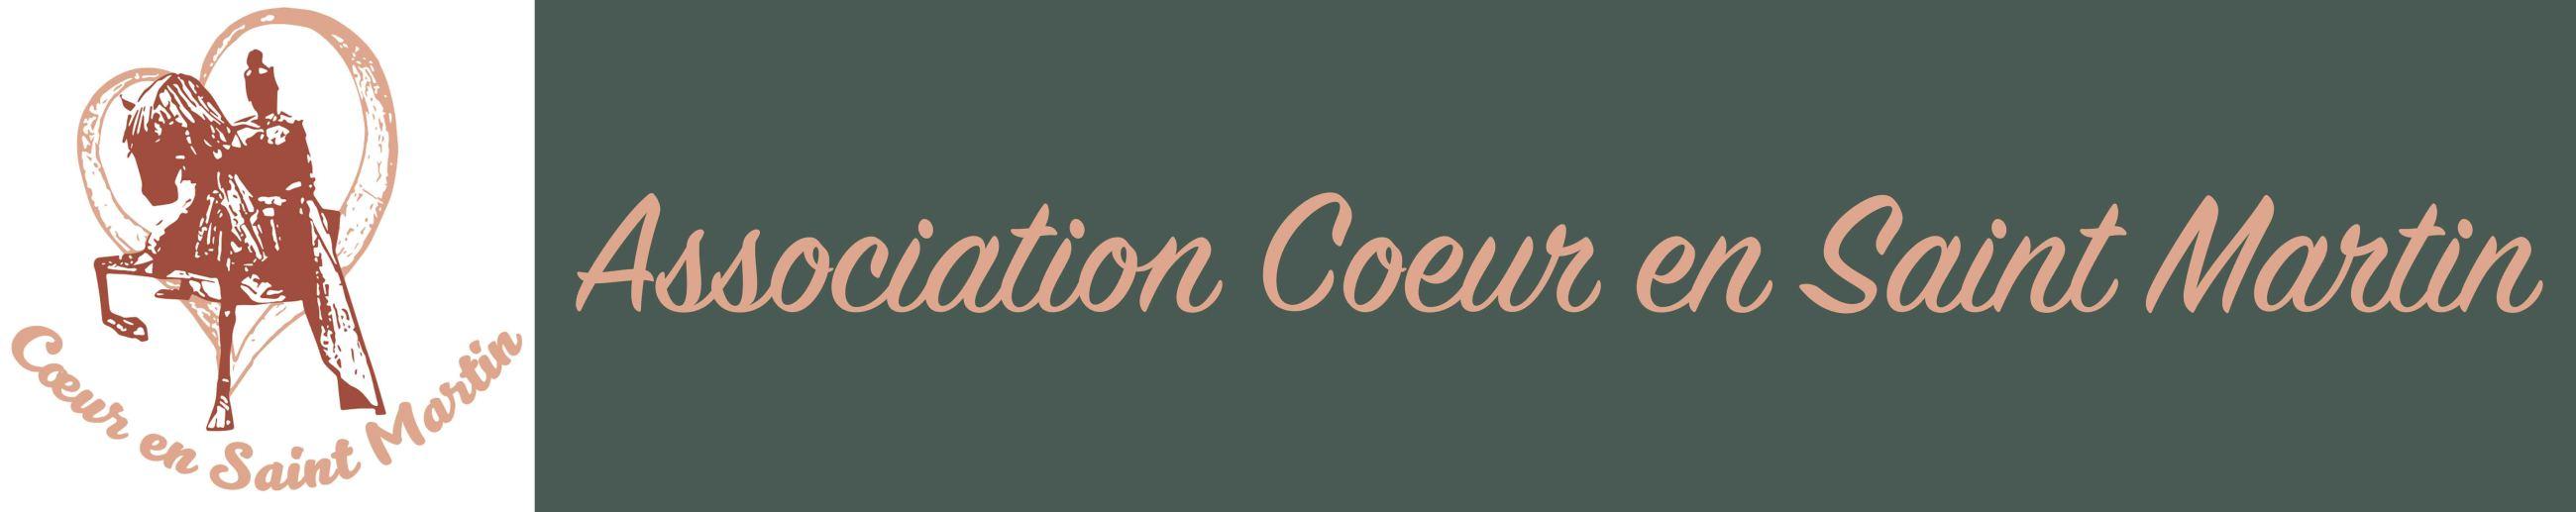 Association Coeur en Saint Martin